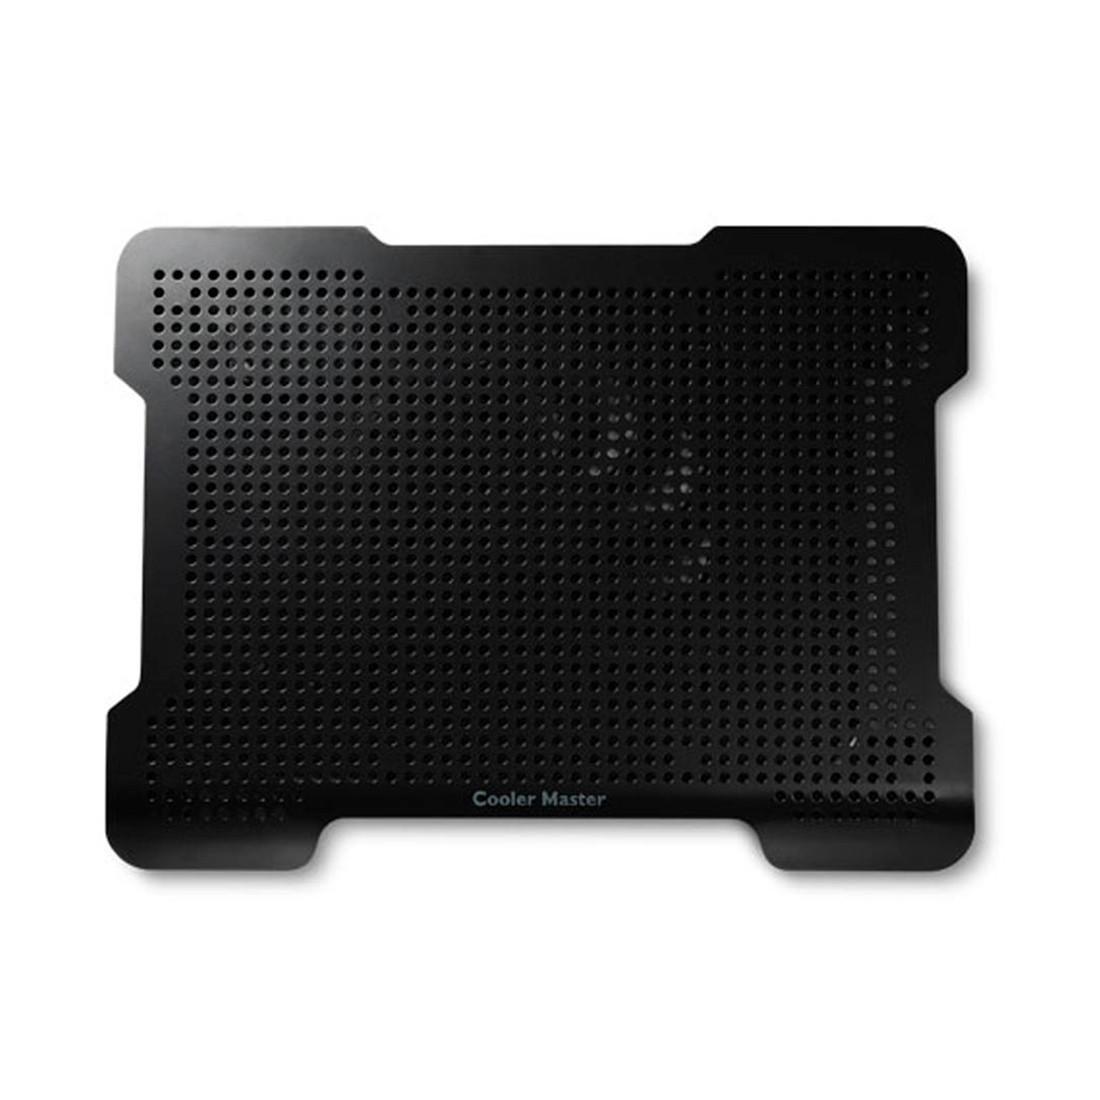 Охлаждающая подставка для ноутбука Cooler Master X-Lite II (R9-NBC-XL2K-GP)